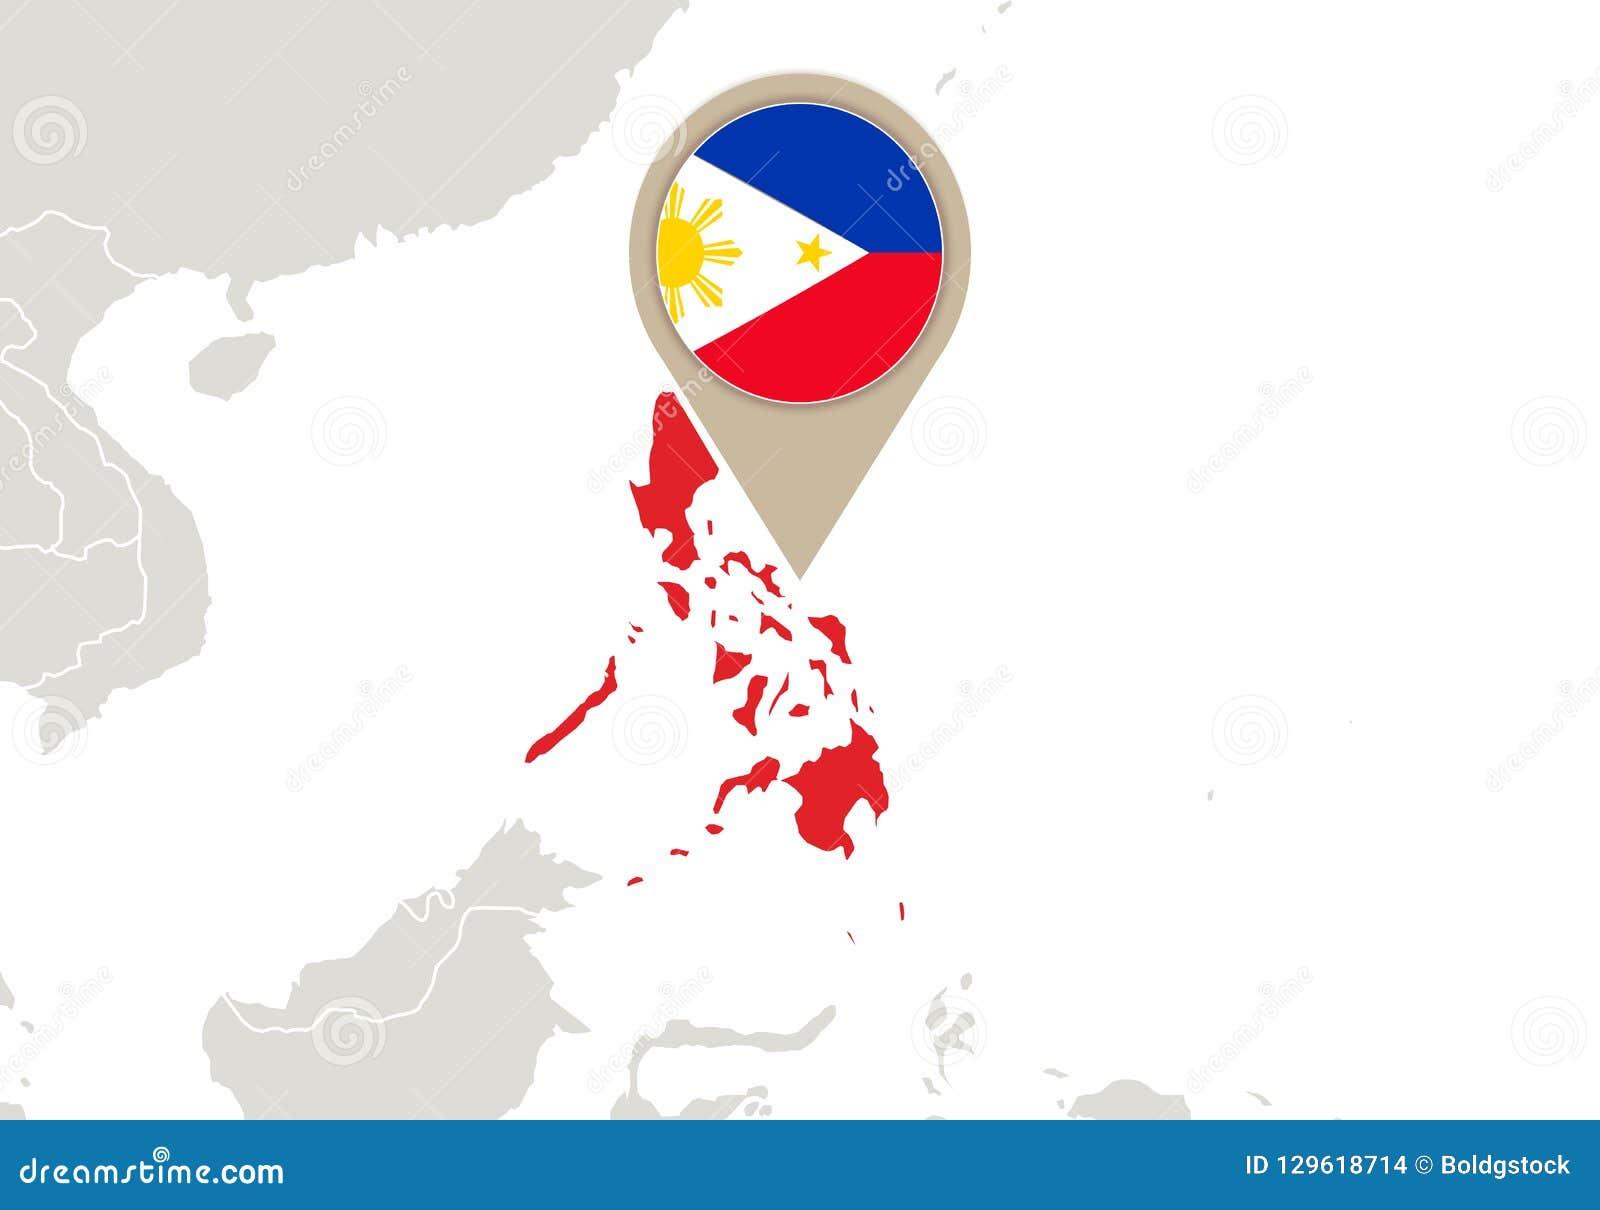 Philippines On World Map Stock Vector Illustration Of Landmark